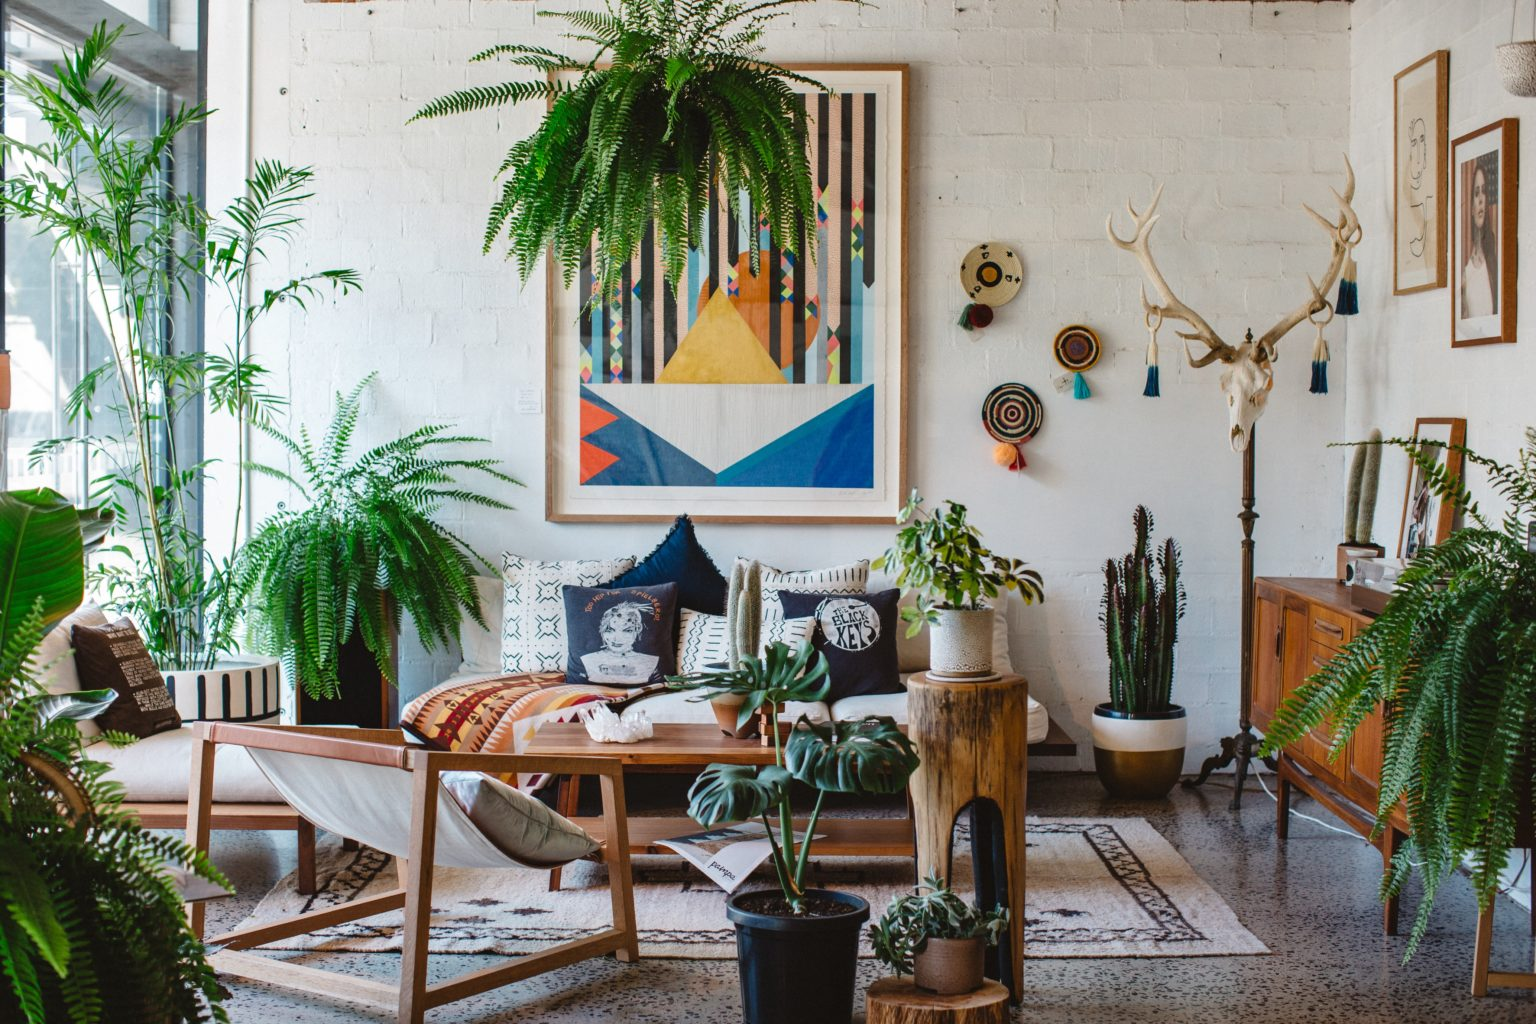 Stile bohoemian jungle: 5 elementi fondamentali per ricrearlo in casa